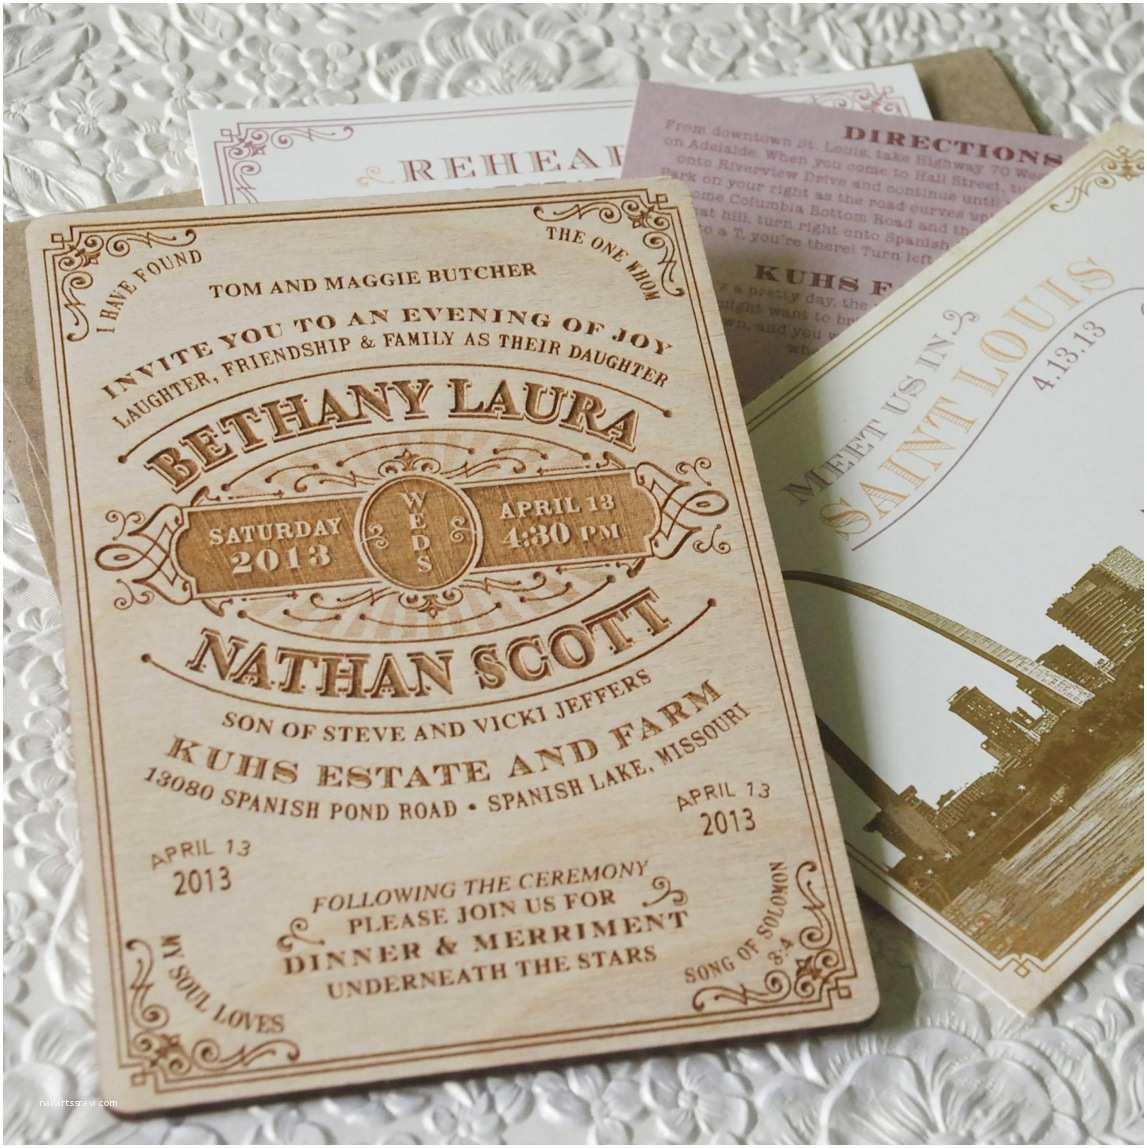 Wedding Invitation Ideas Unique Ideas for Wedding Invites Cheap Designs with